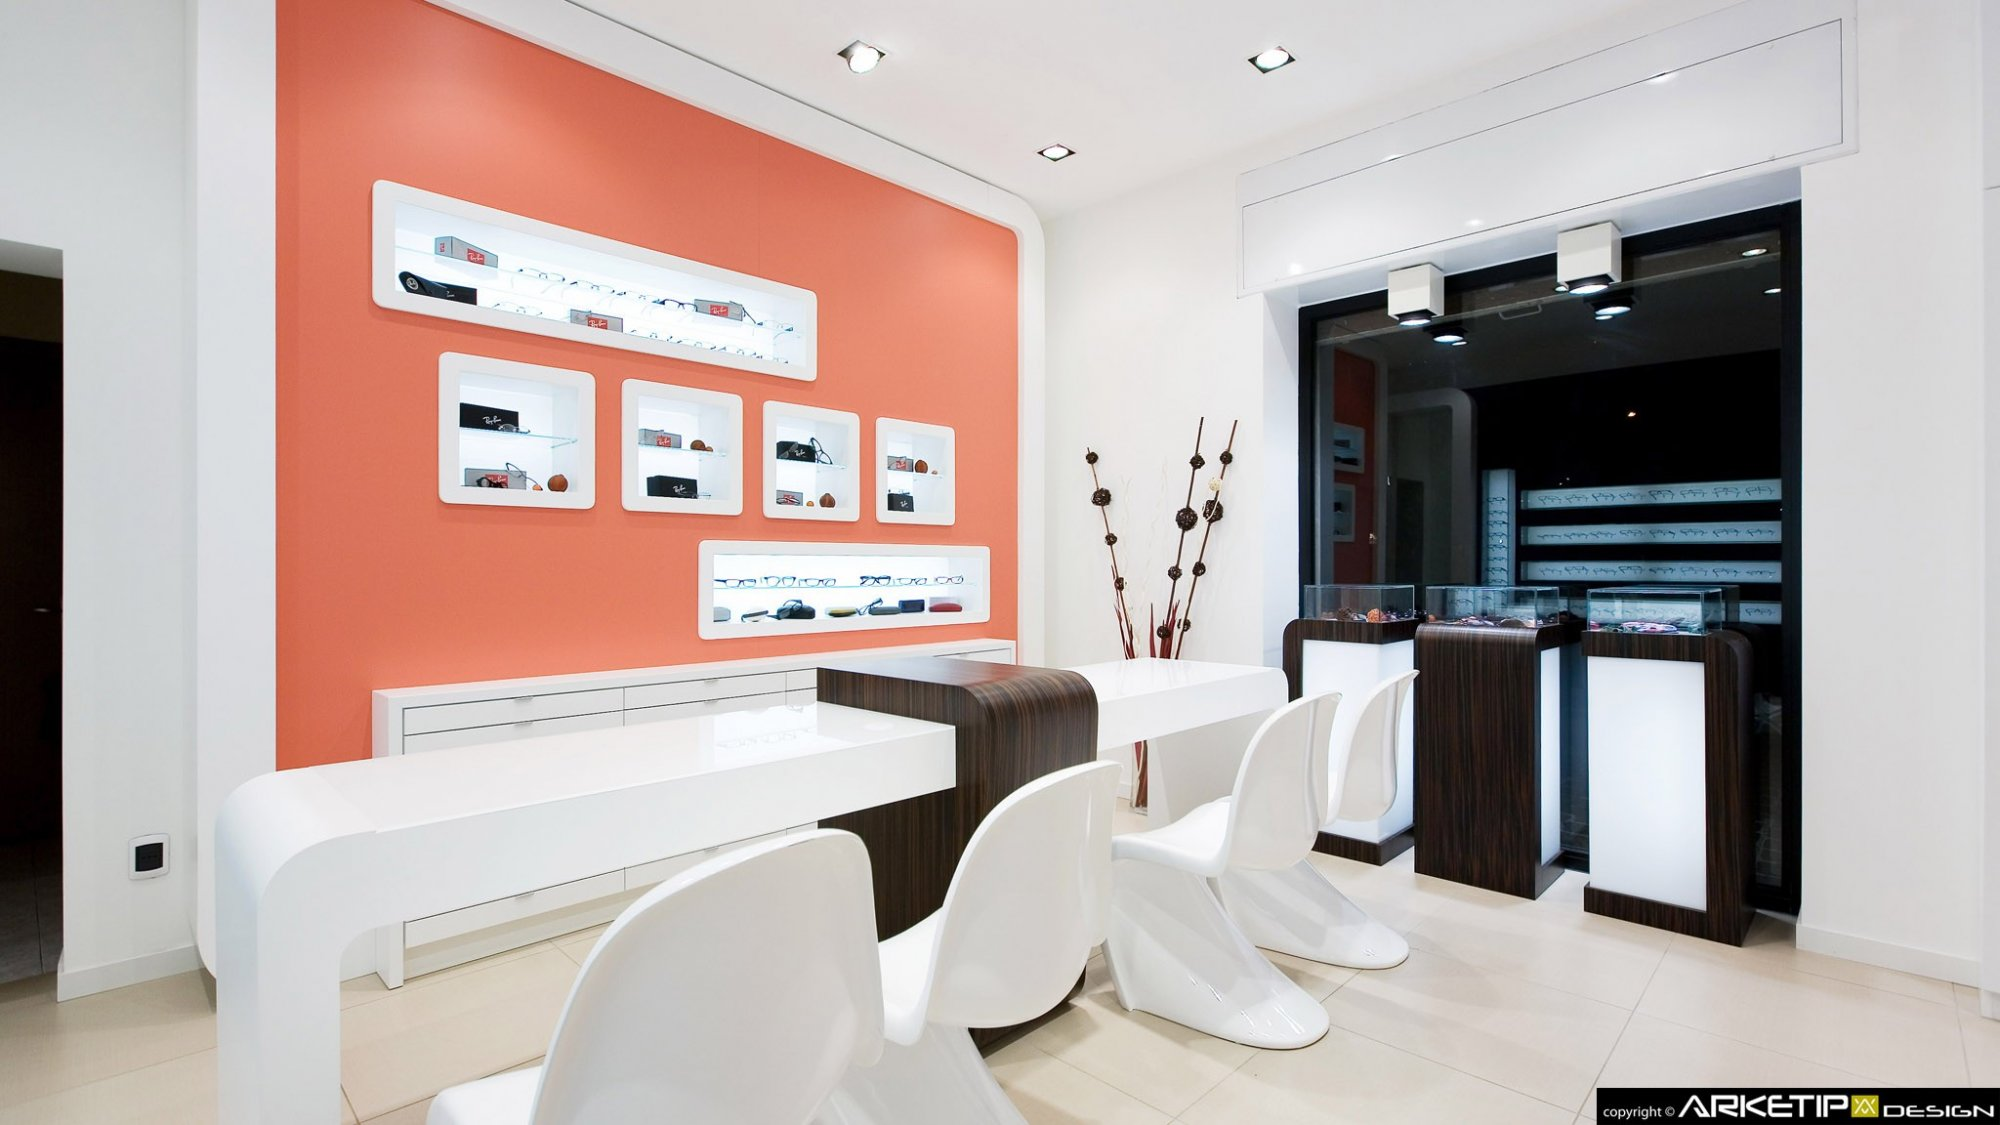 Negozi Ferrara : Arredamenti per negozi ferrara. Arredamento negozi ...